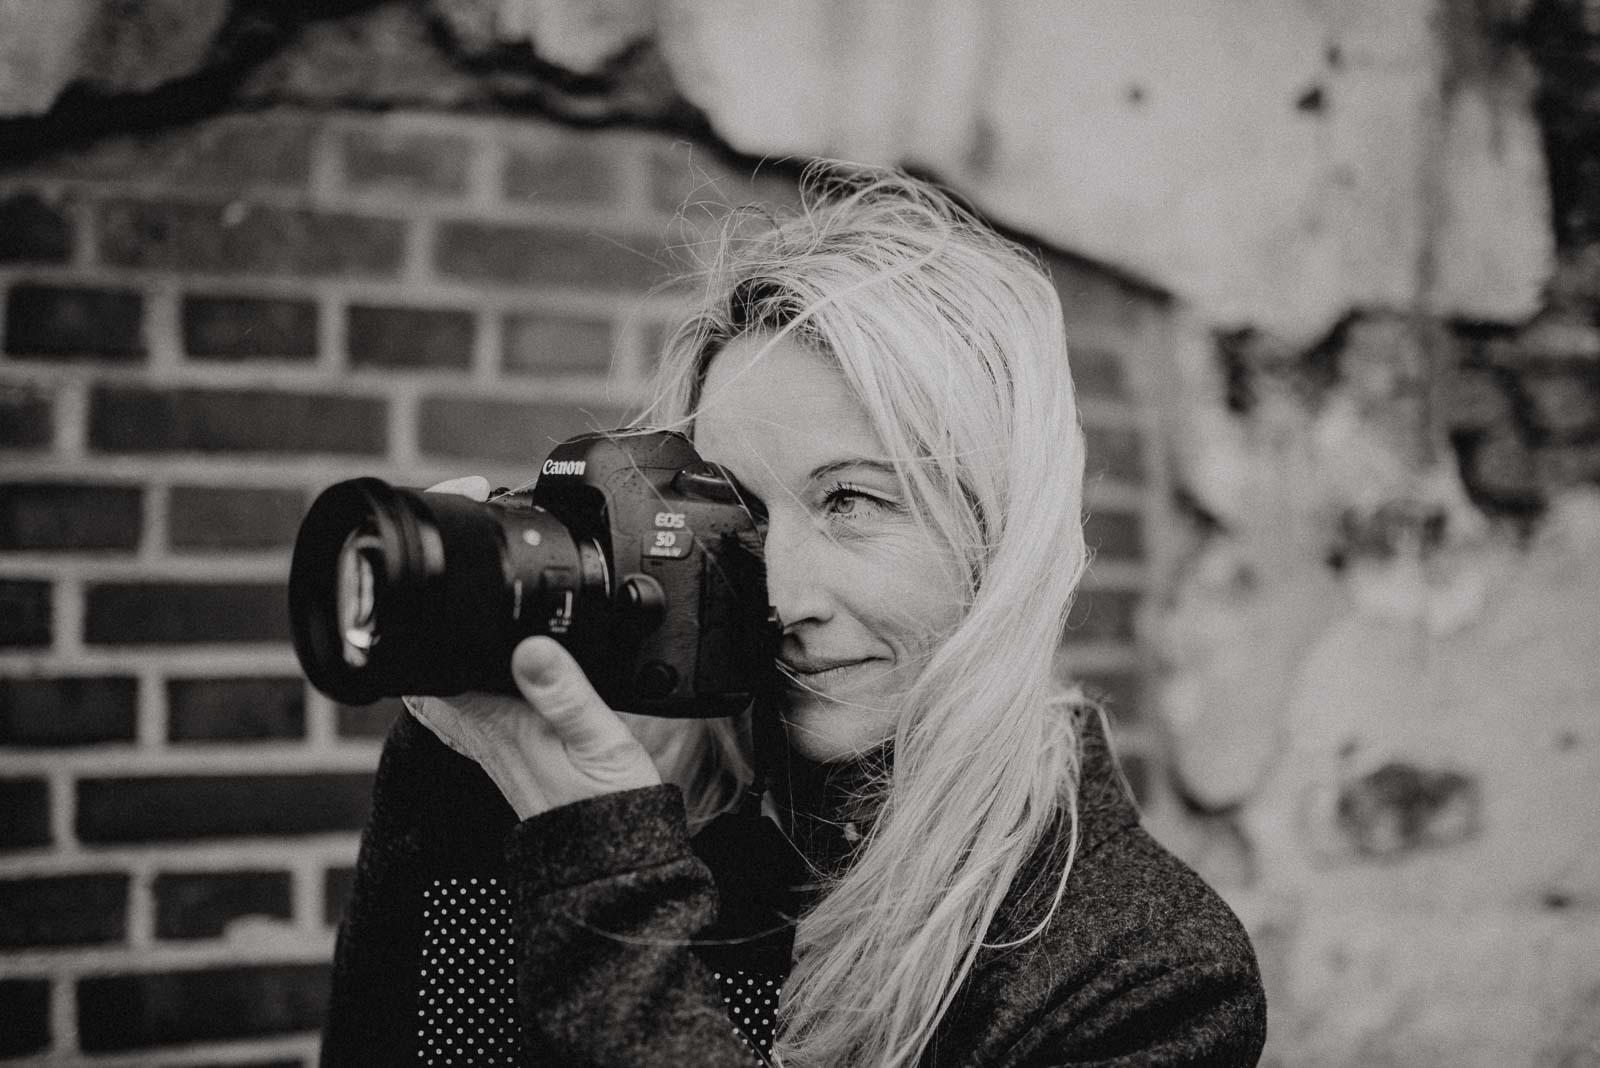 047-fotograf-witten-bochum-businessshooting-urban